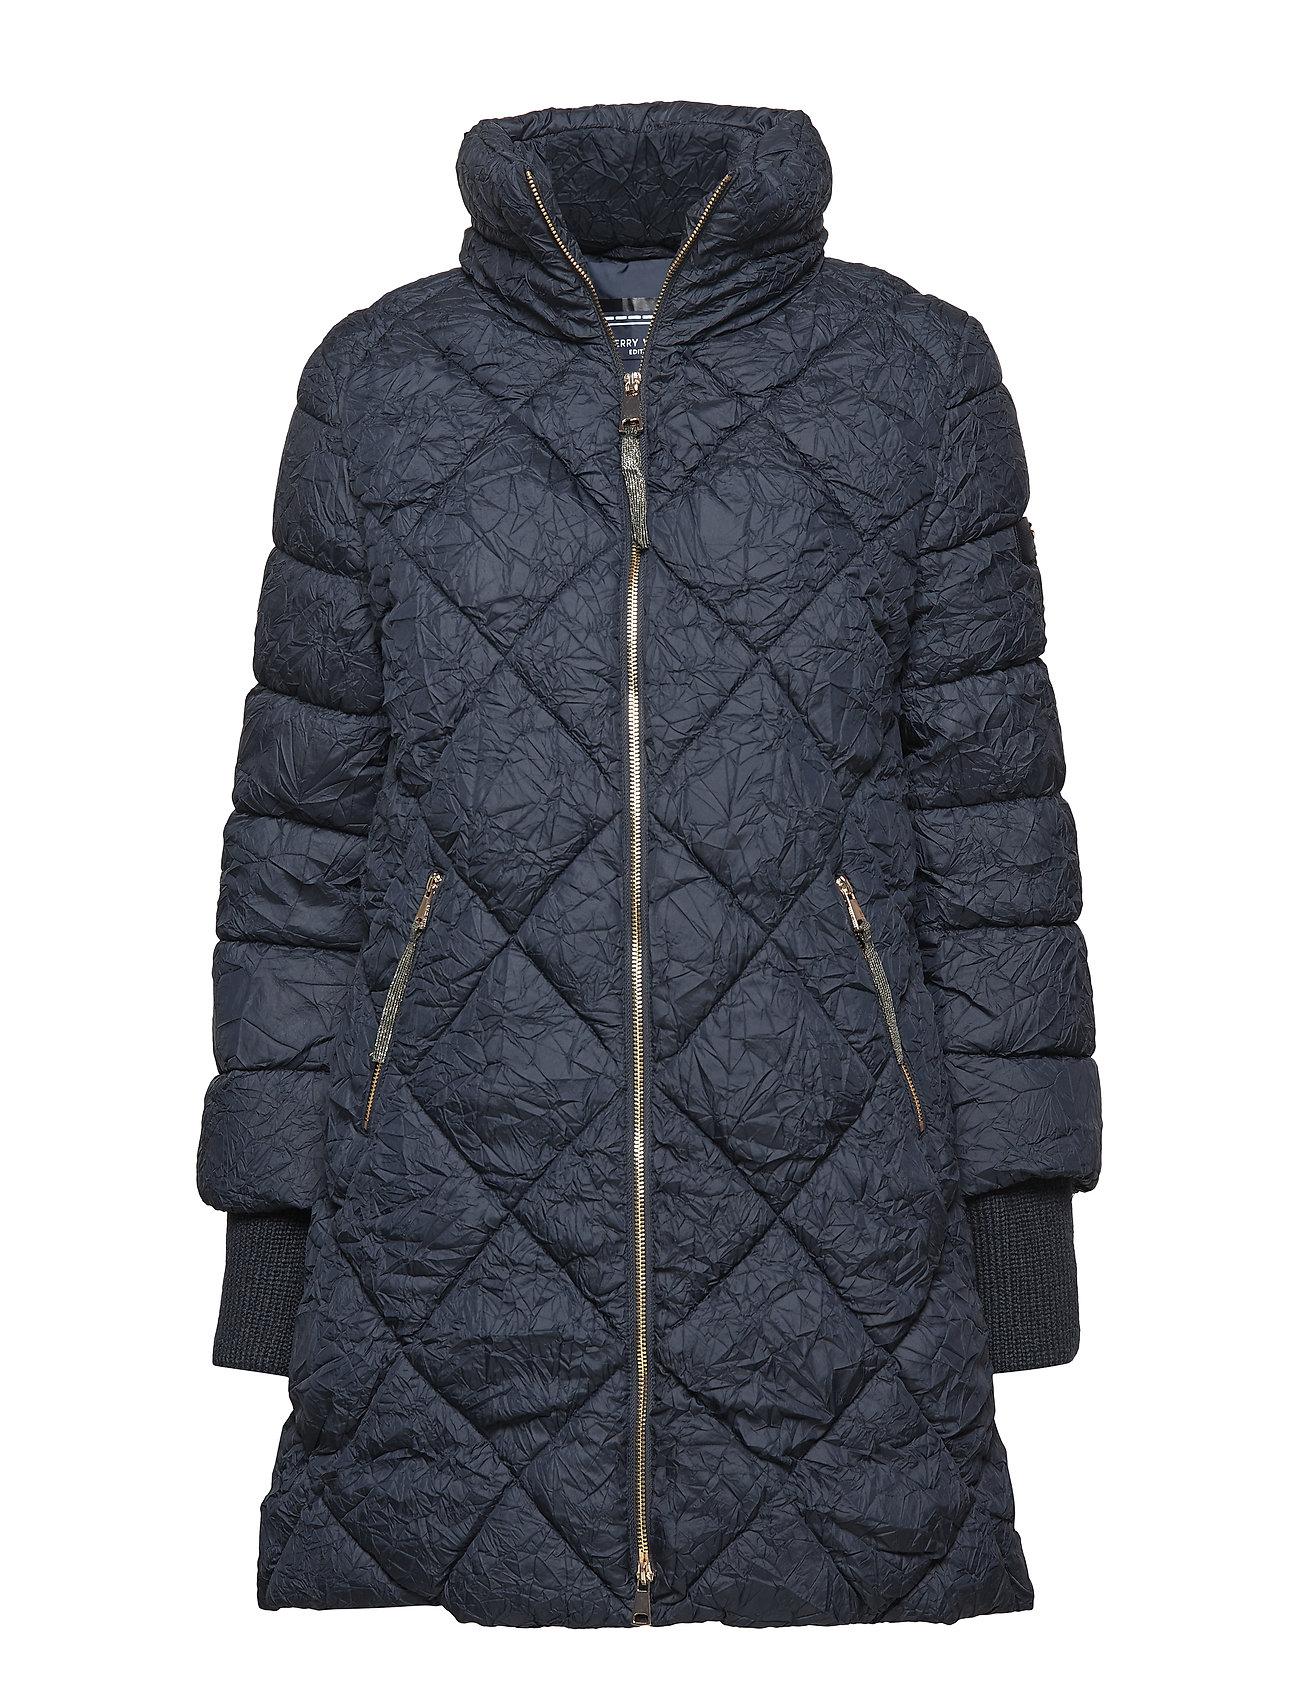 Coat Not Wool - Gerry Weber Edition